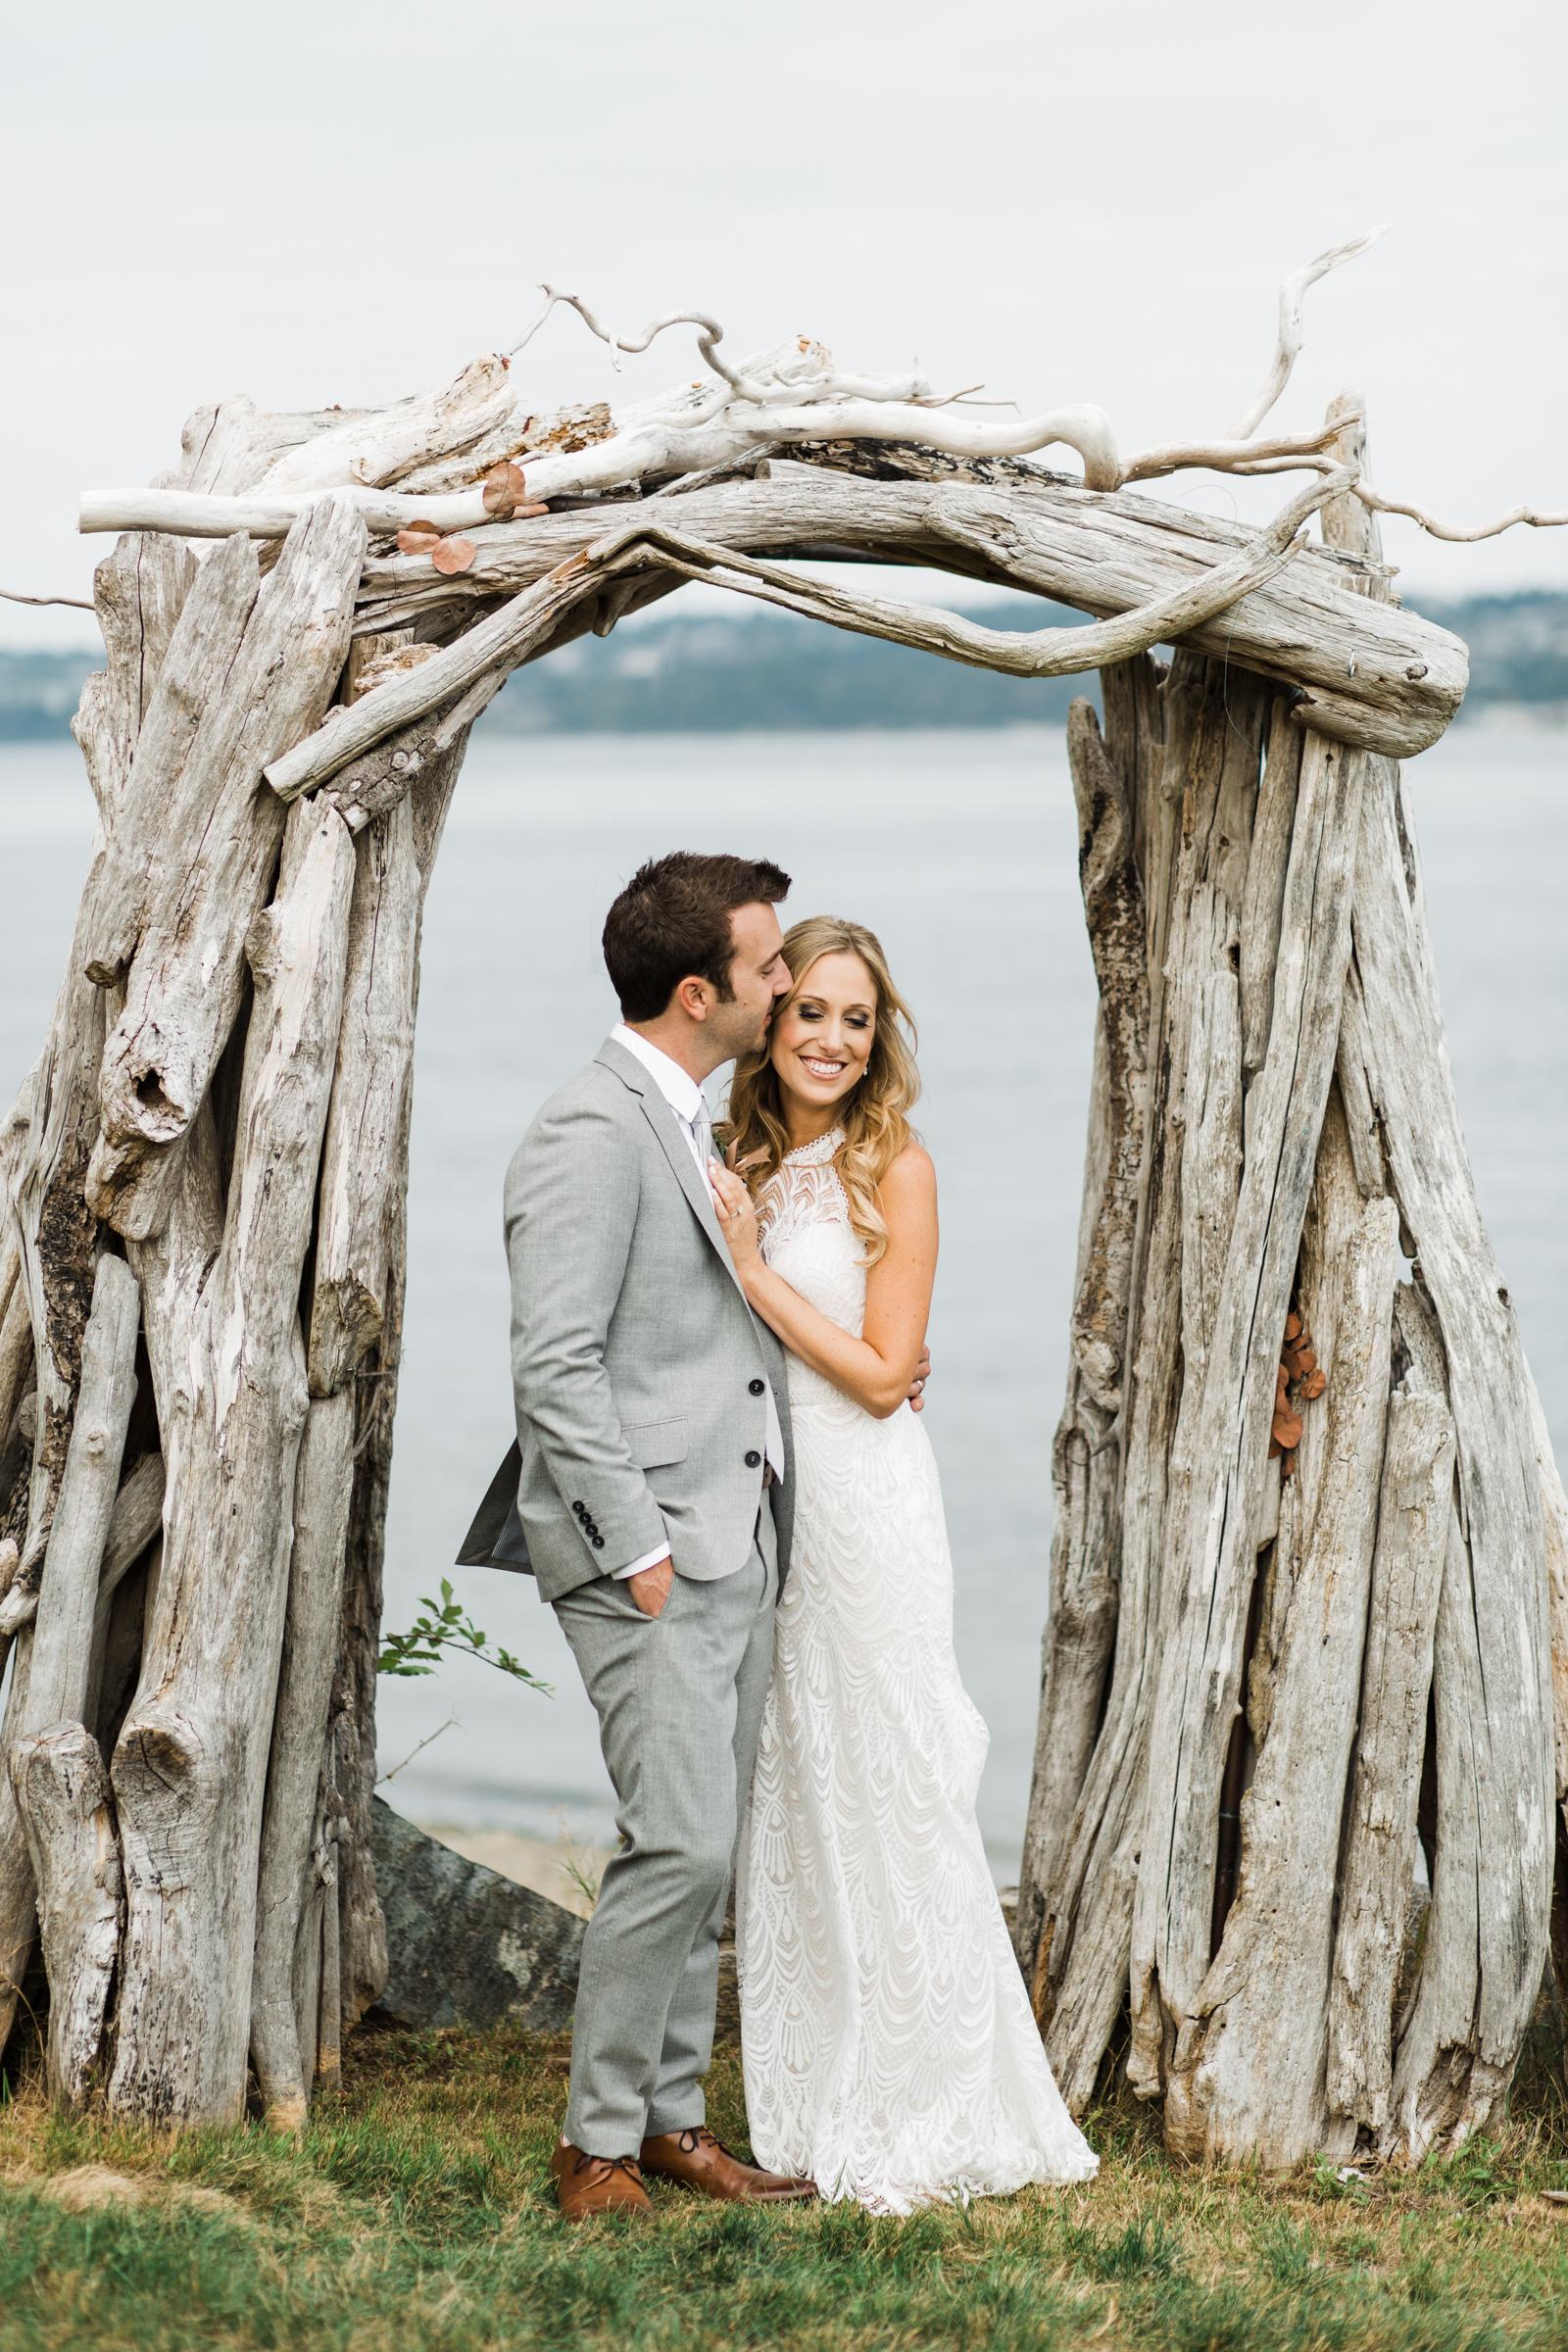 Couple cuddling under driftwood arbor - photo by Stephanie Cristalli Photography